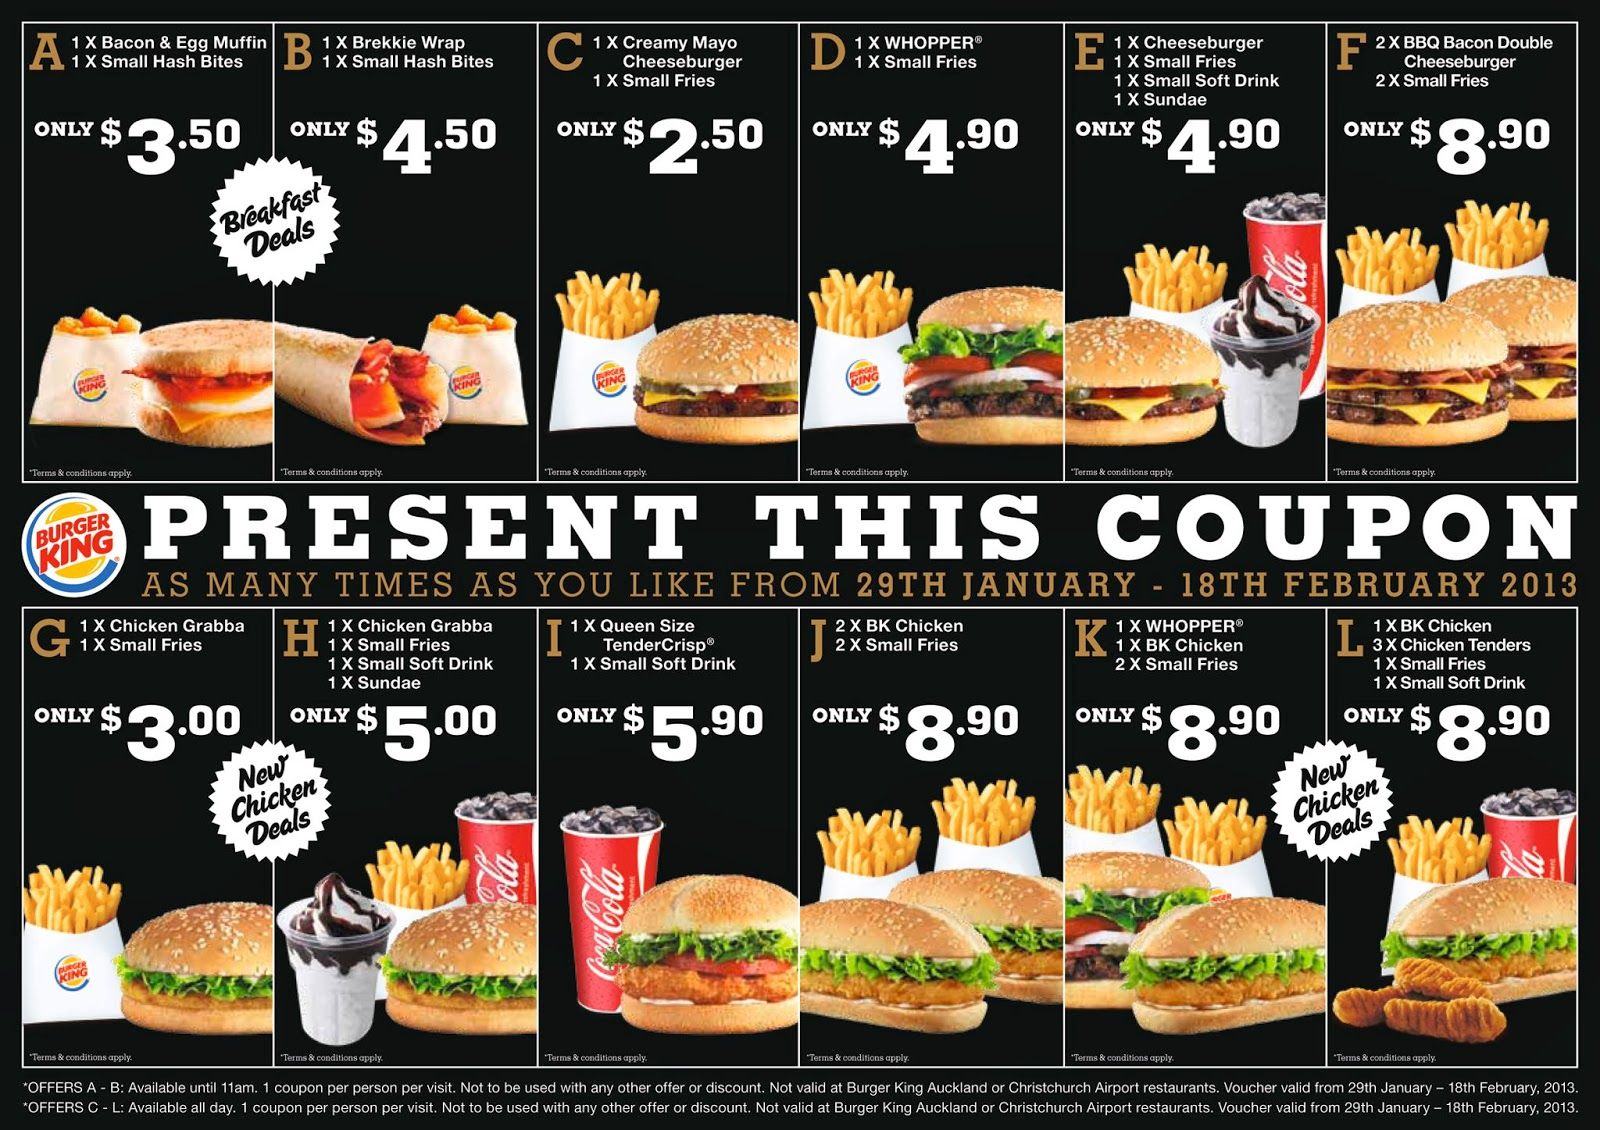 Printable Coupons: Burger King Coupons…   Burger King   Pinterest - Burger King Free Coupons Printable